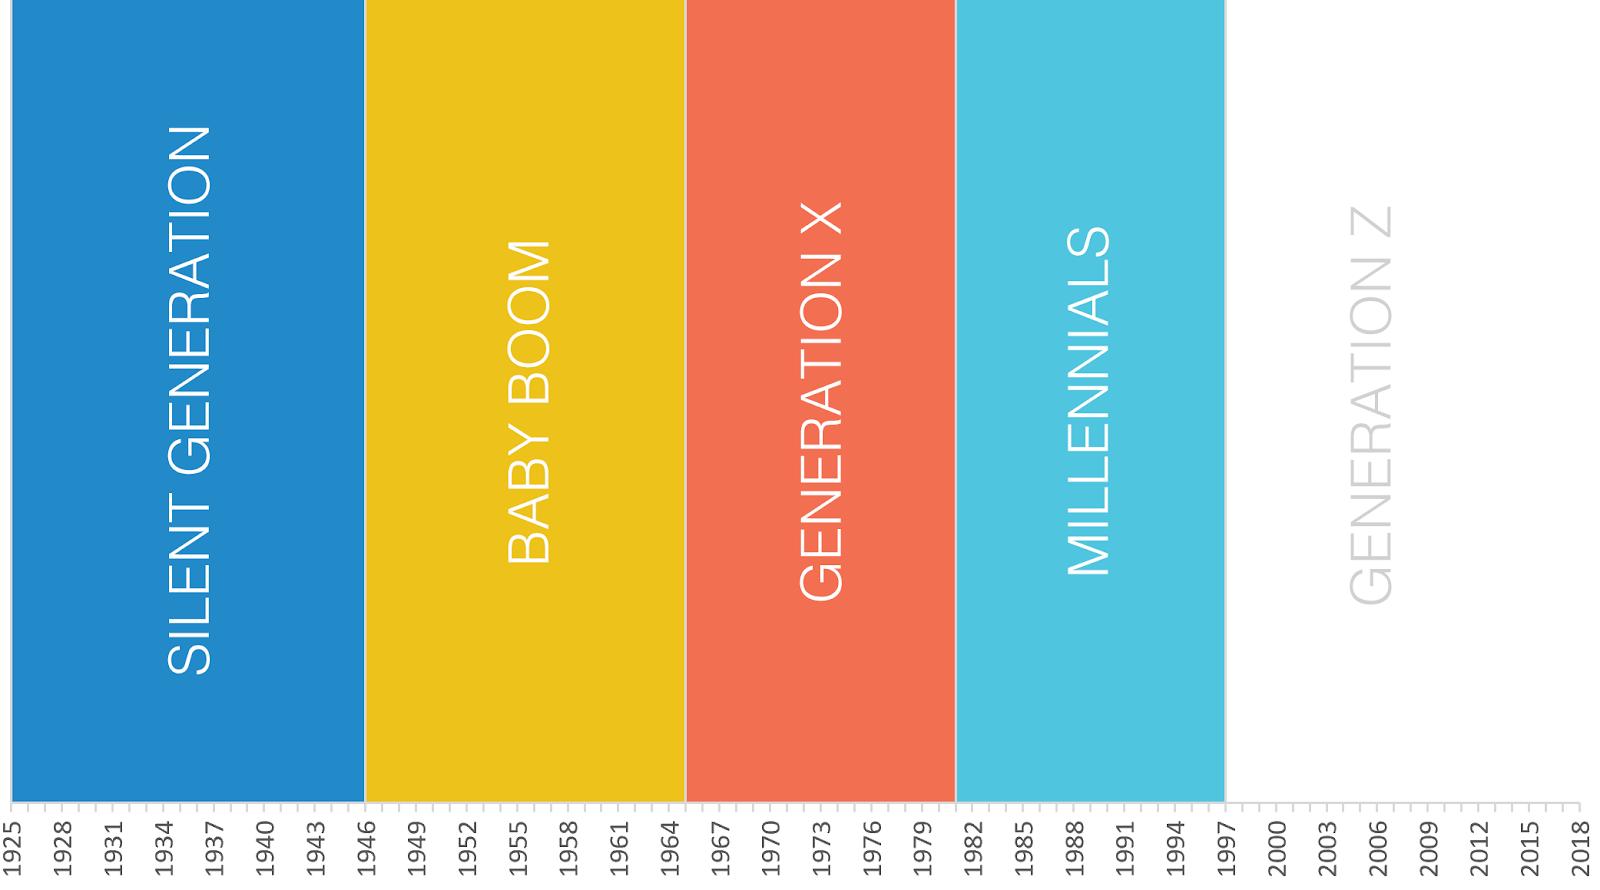 Silent Generation 1925-1945 Baby Boom 1946-1964 Generation X 1965-1980 Millennials 1981-1996 Generation Z 1997-?